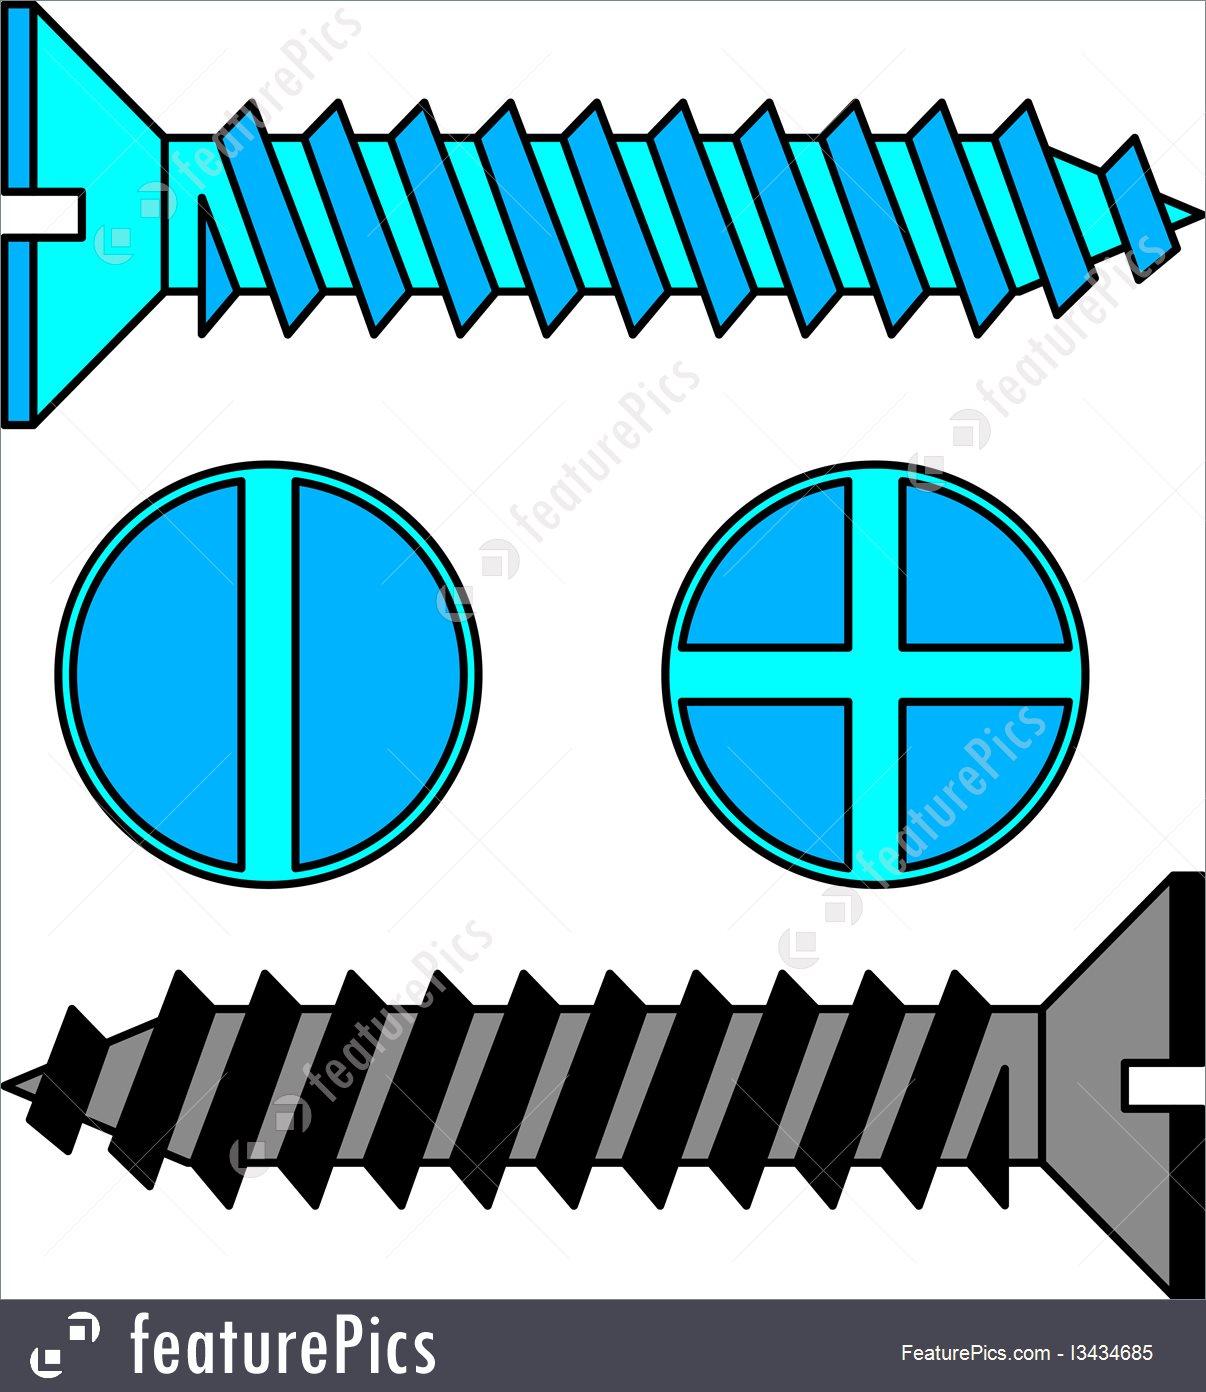 1206x1392 Stainless Steel Screw. Vector